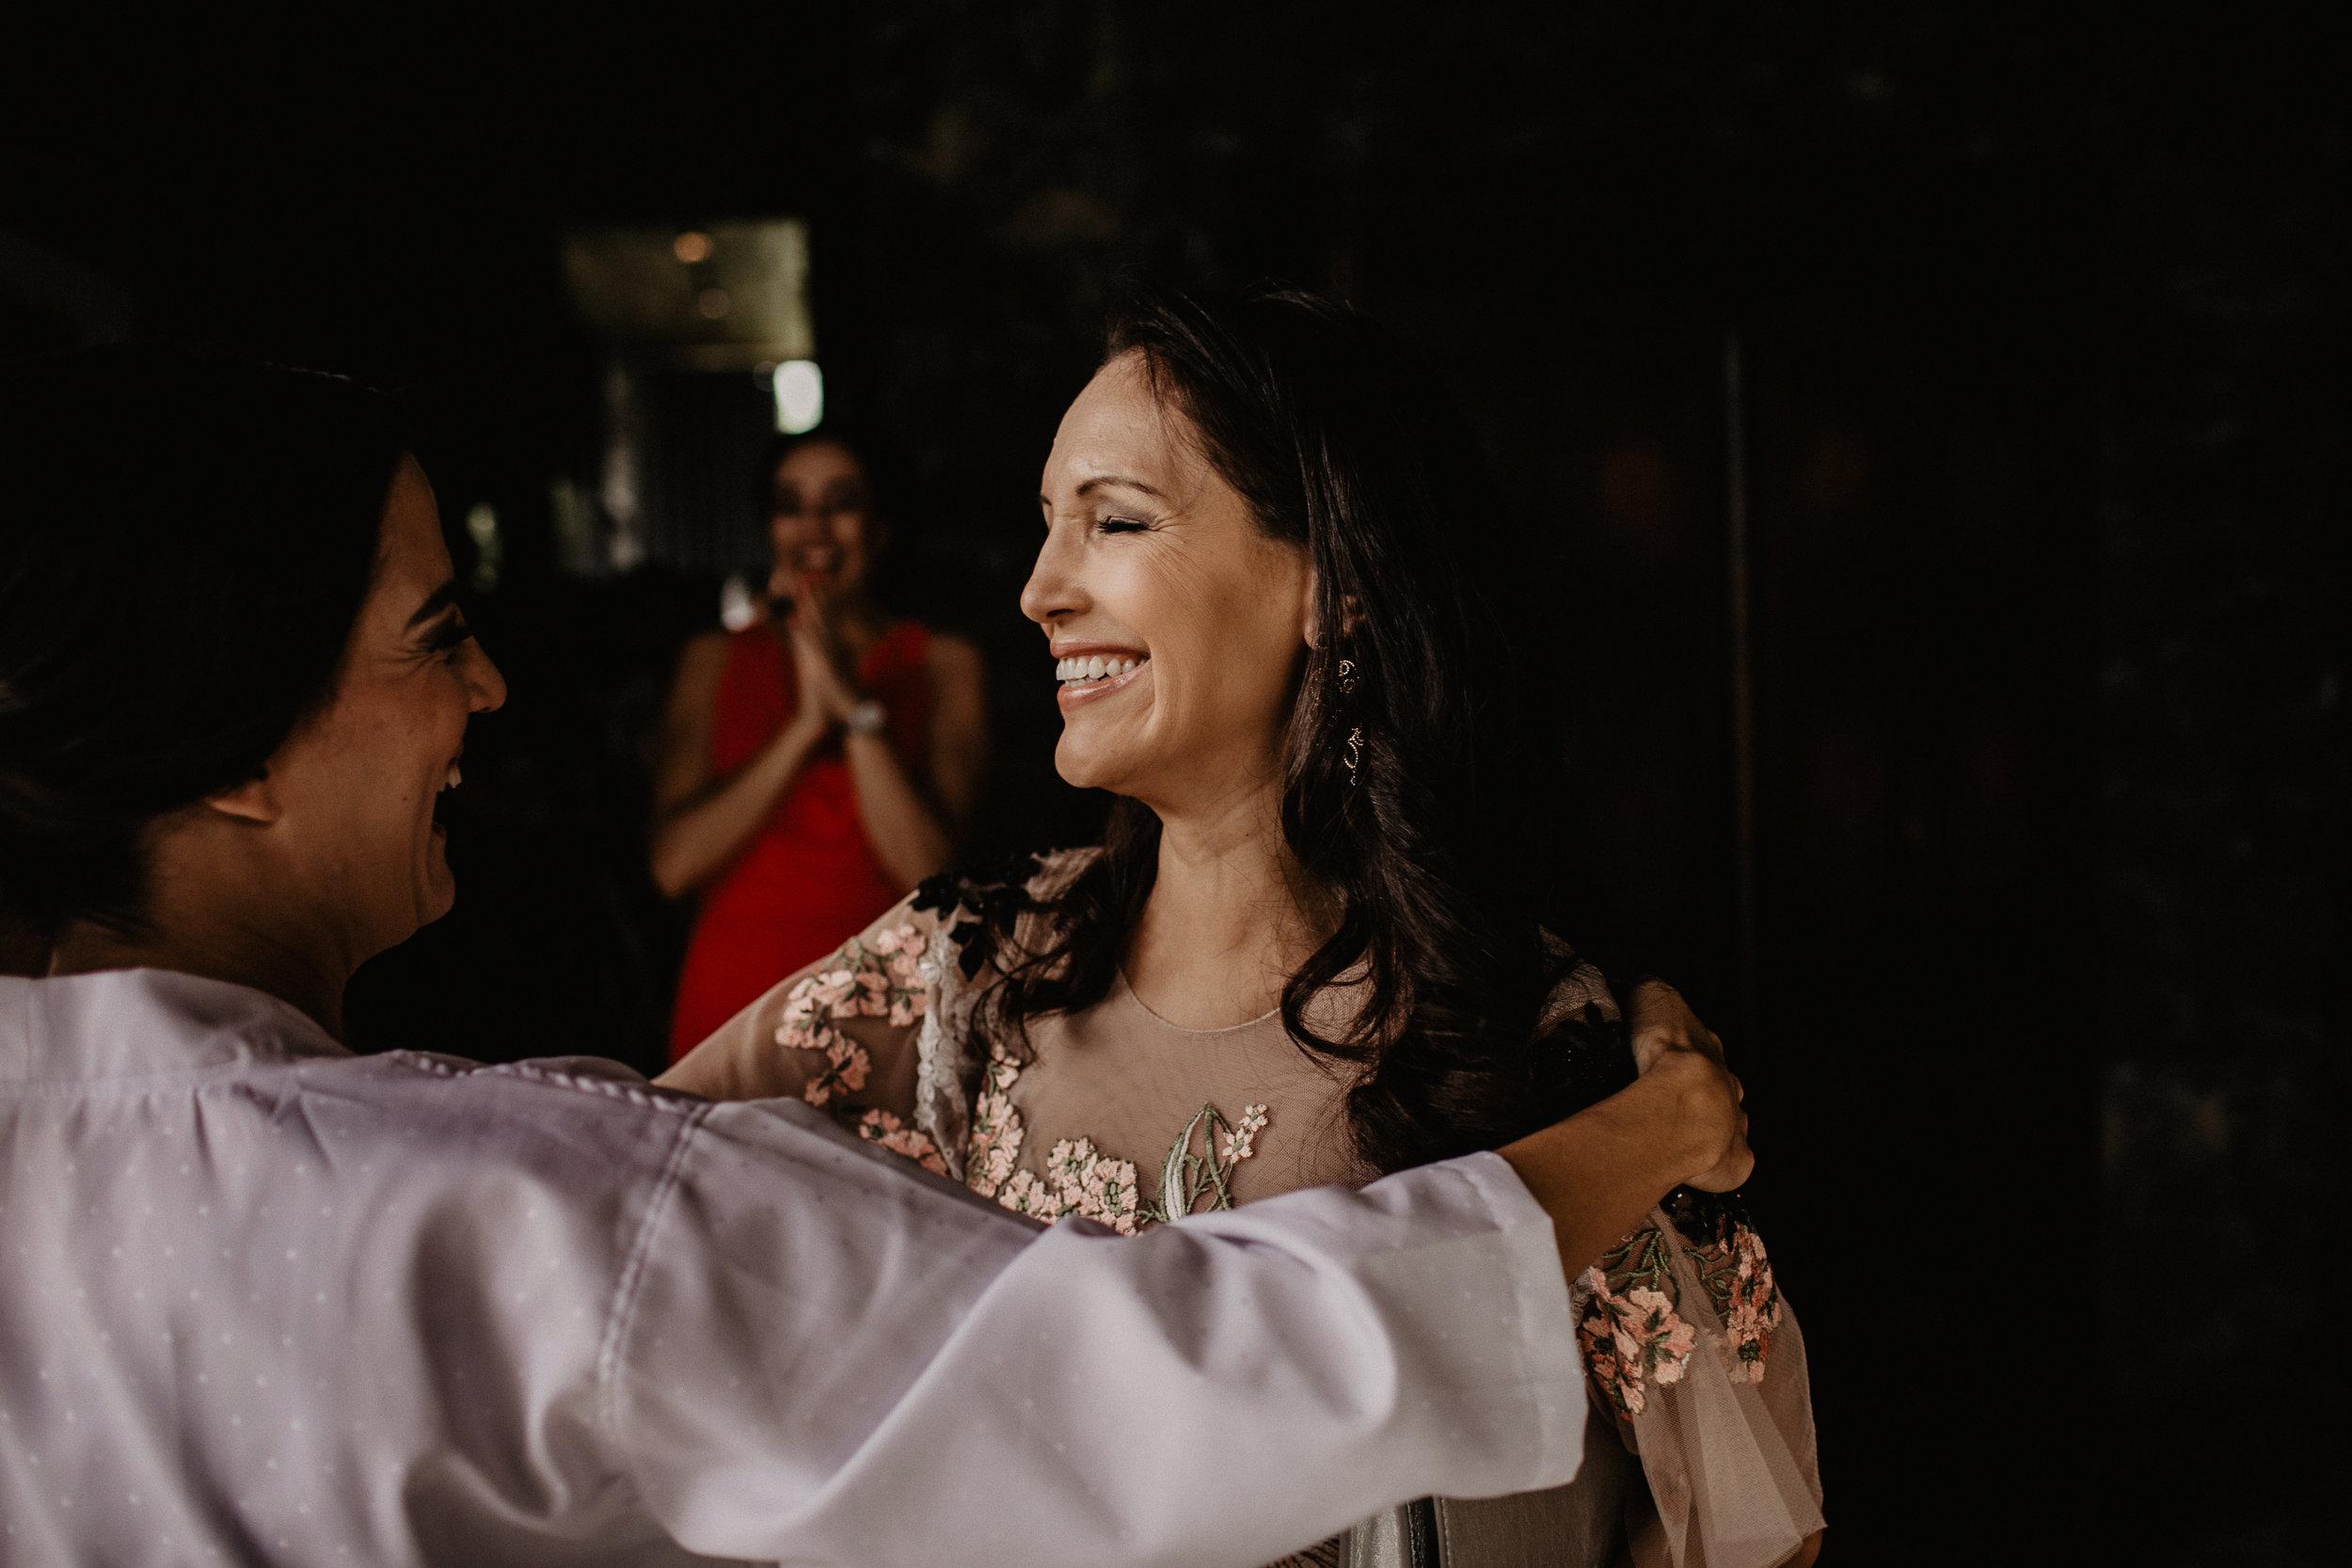 alfonso_flores_destination_wedding_photographer_pau_alonso_111.JPG